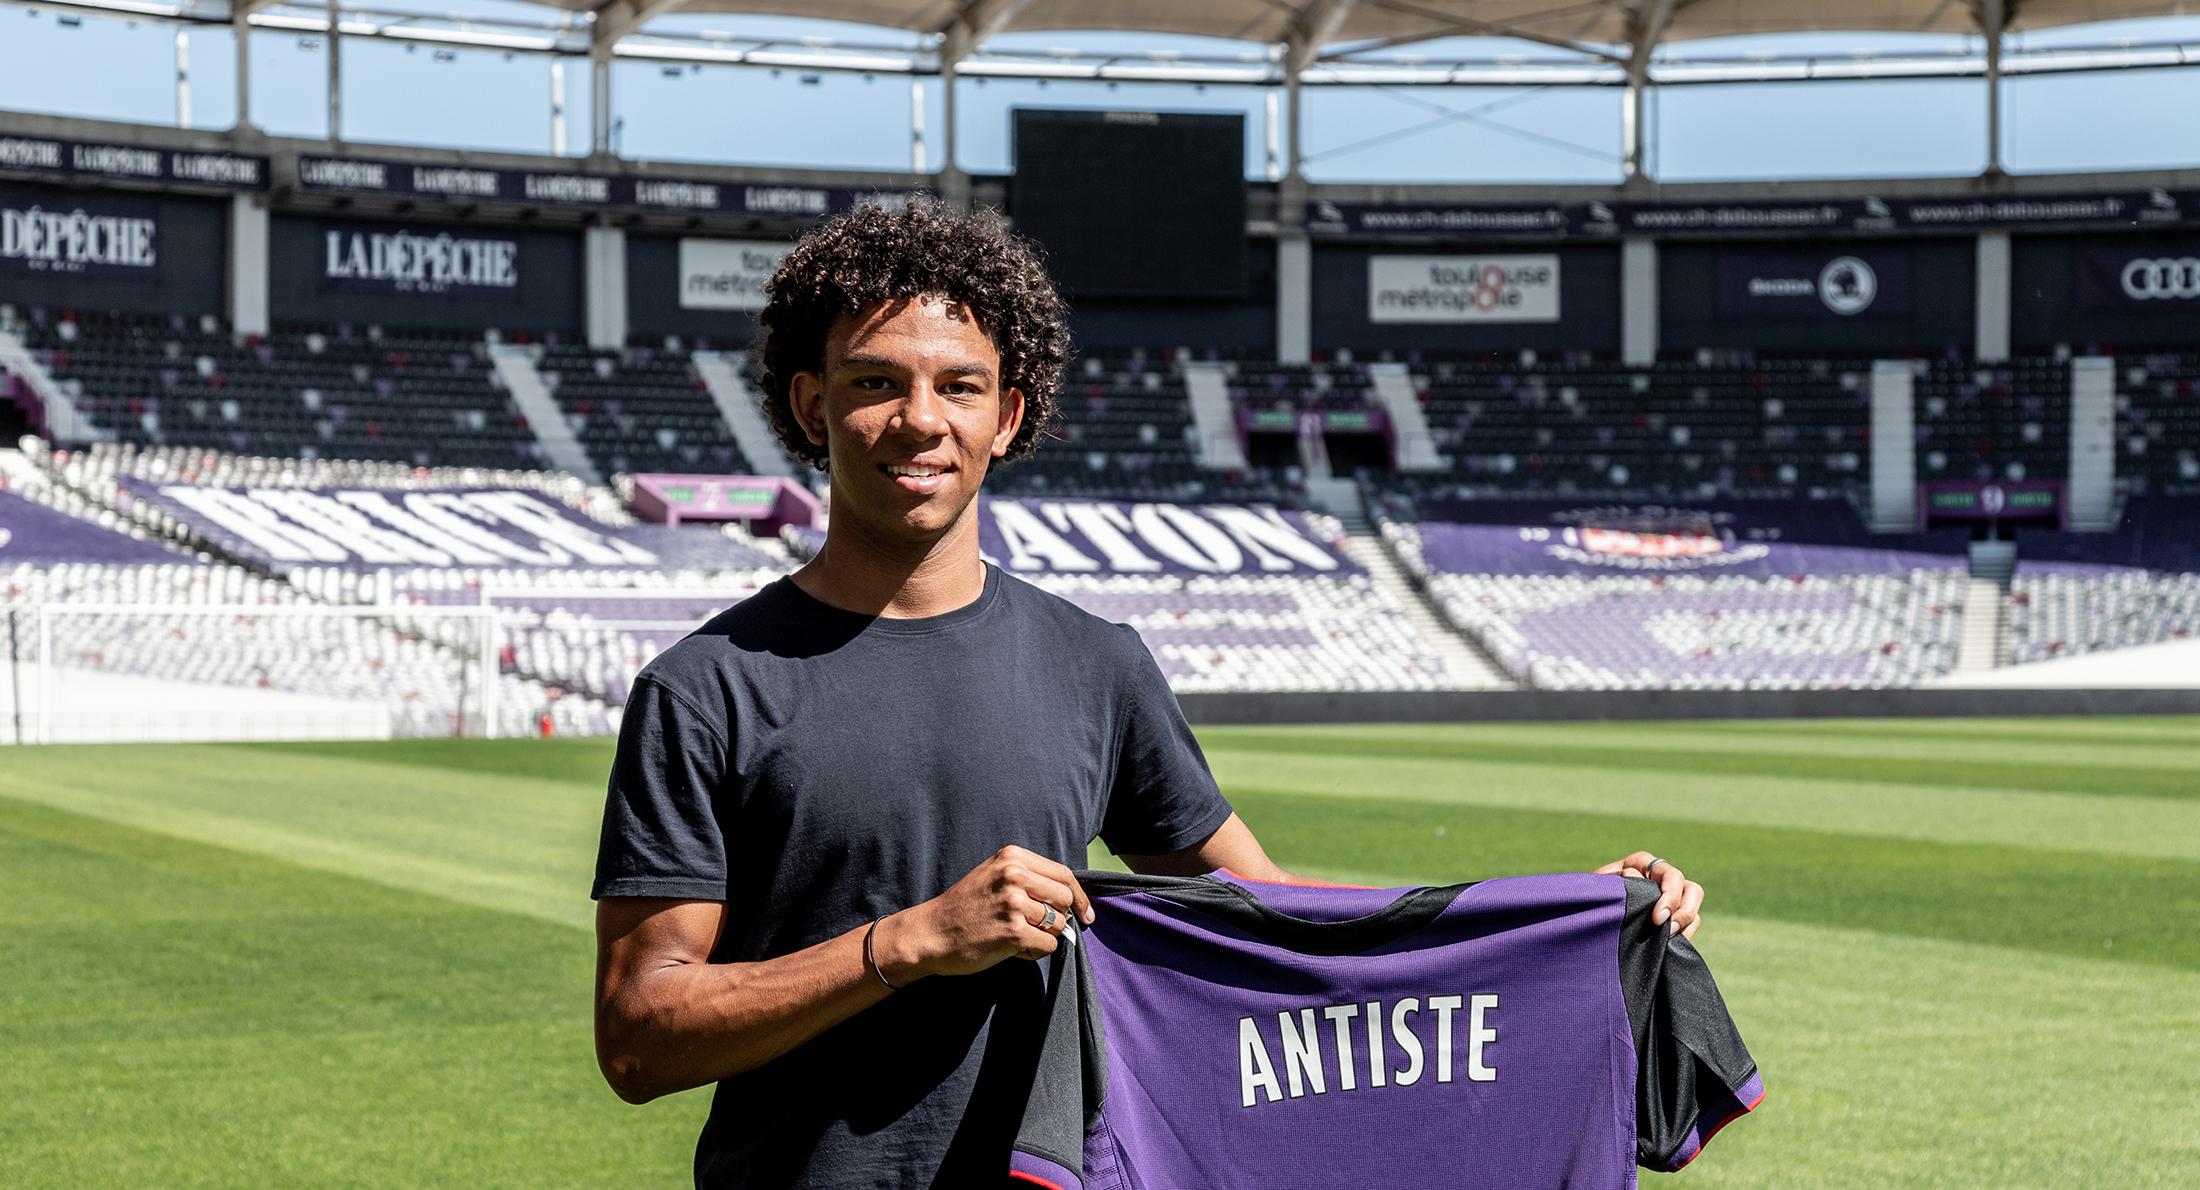 Antiste_Signature_Stadium_0.jpg